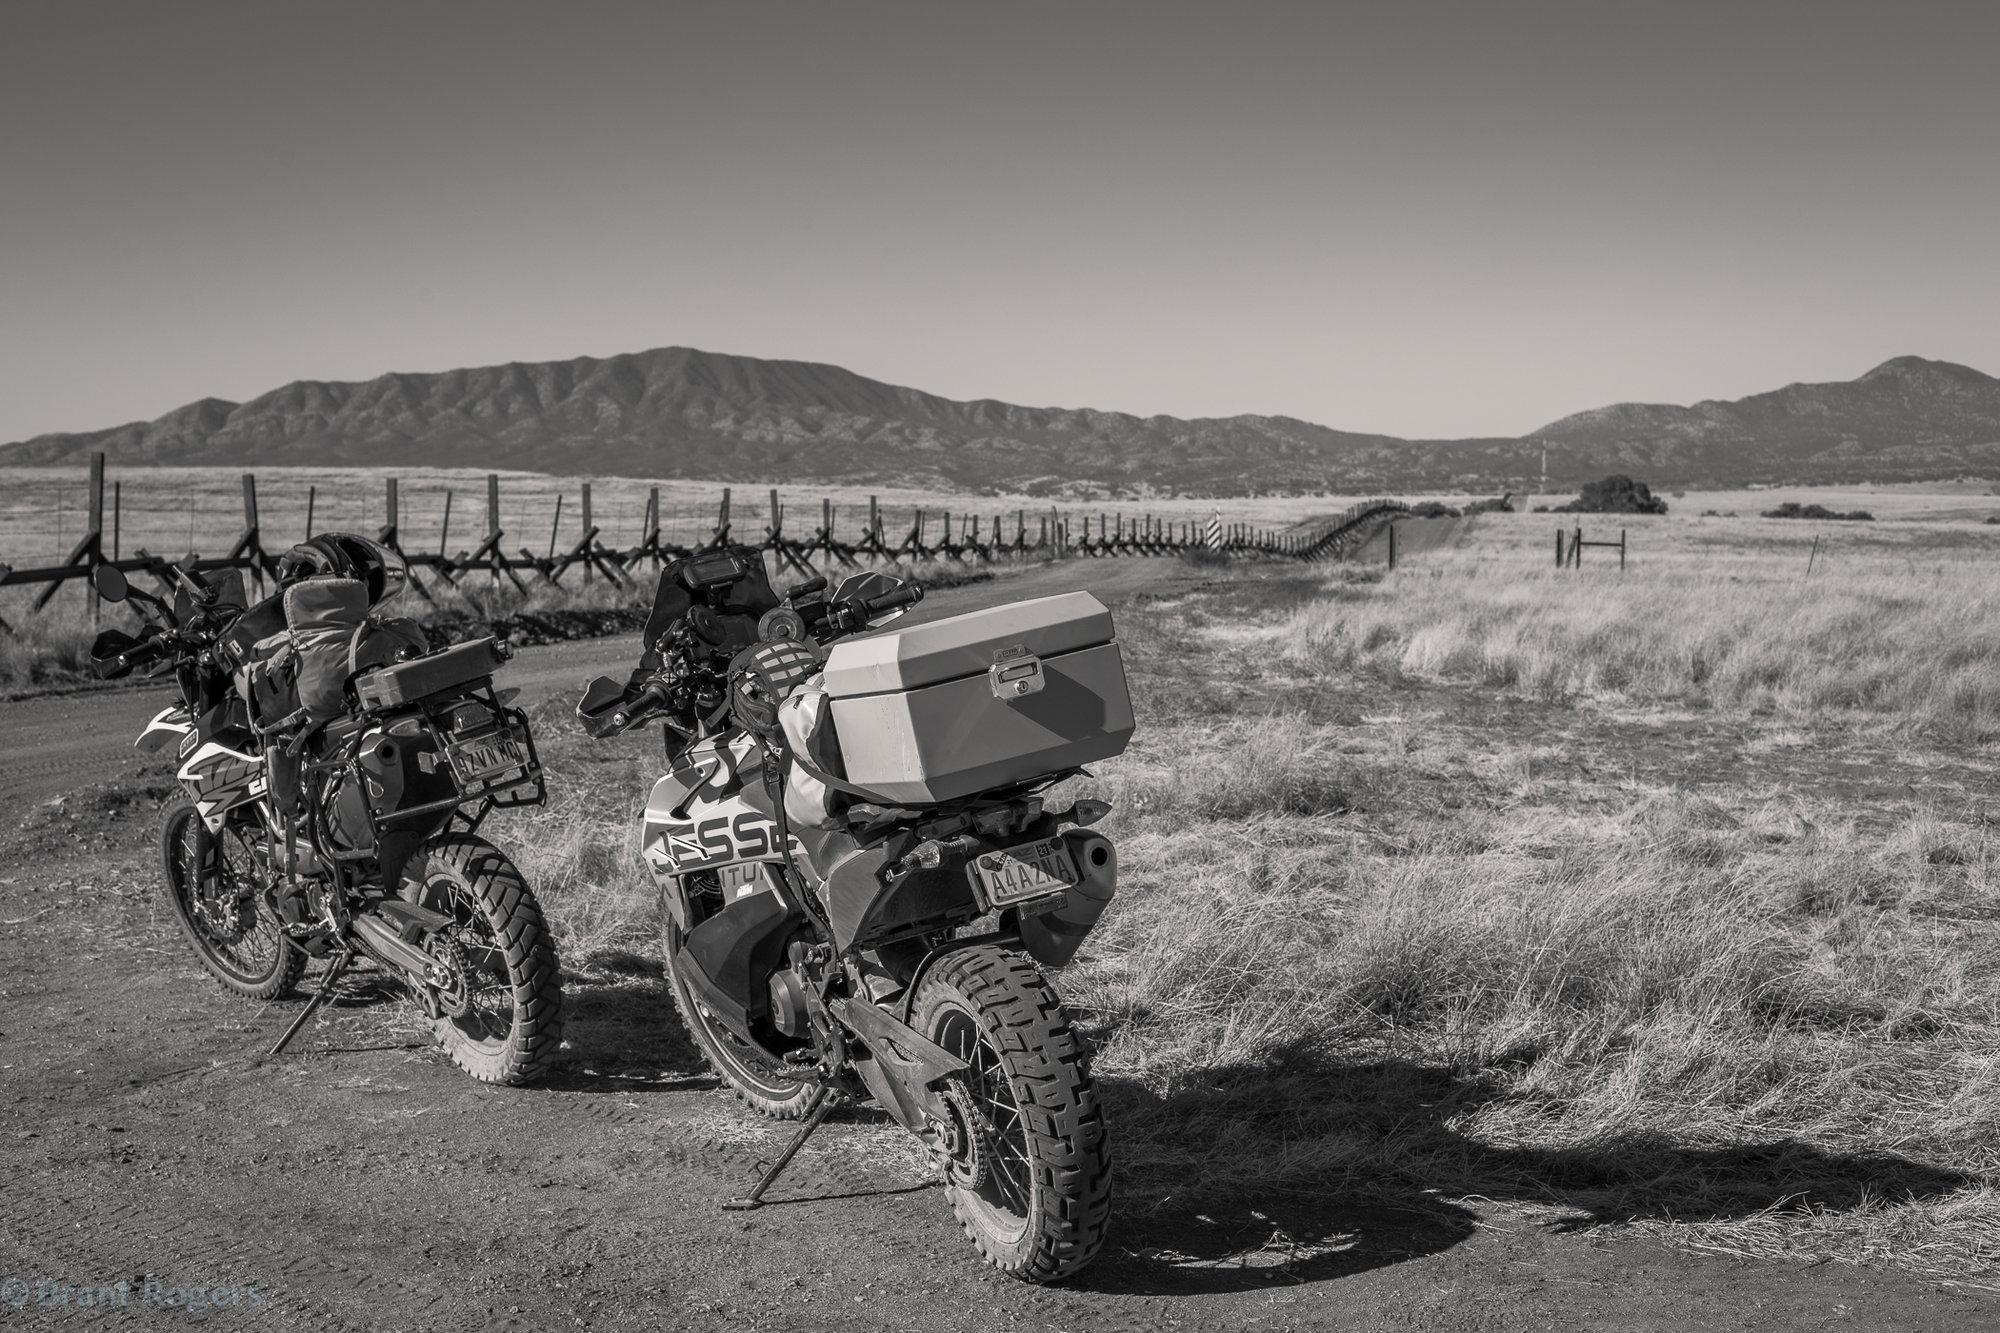 fence bikes-1.jpg